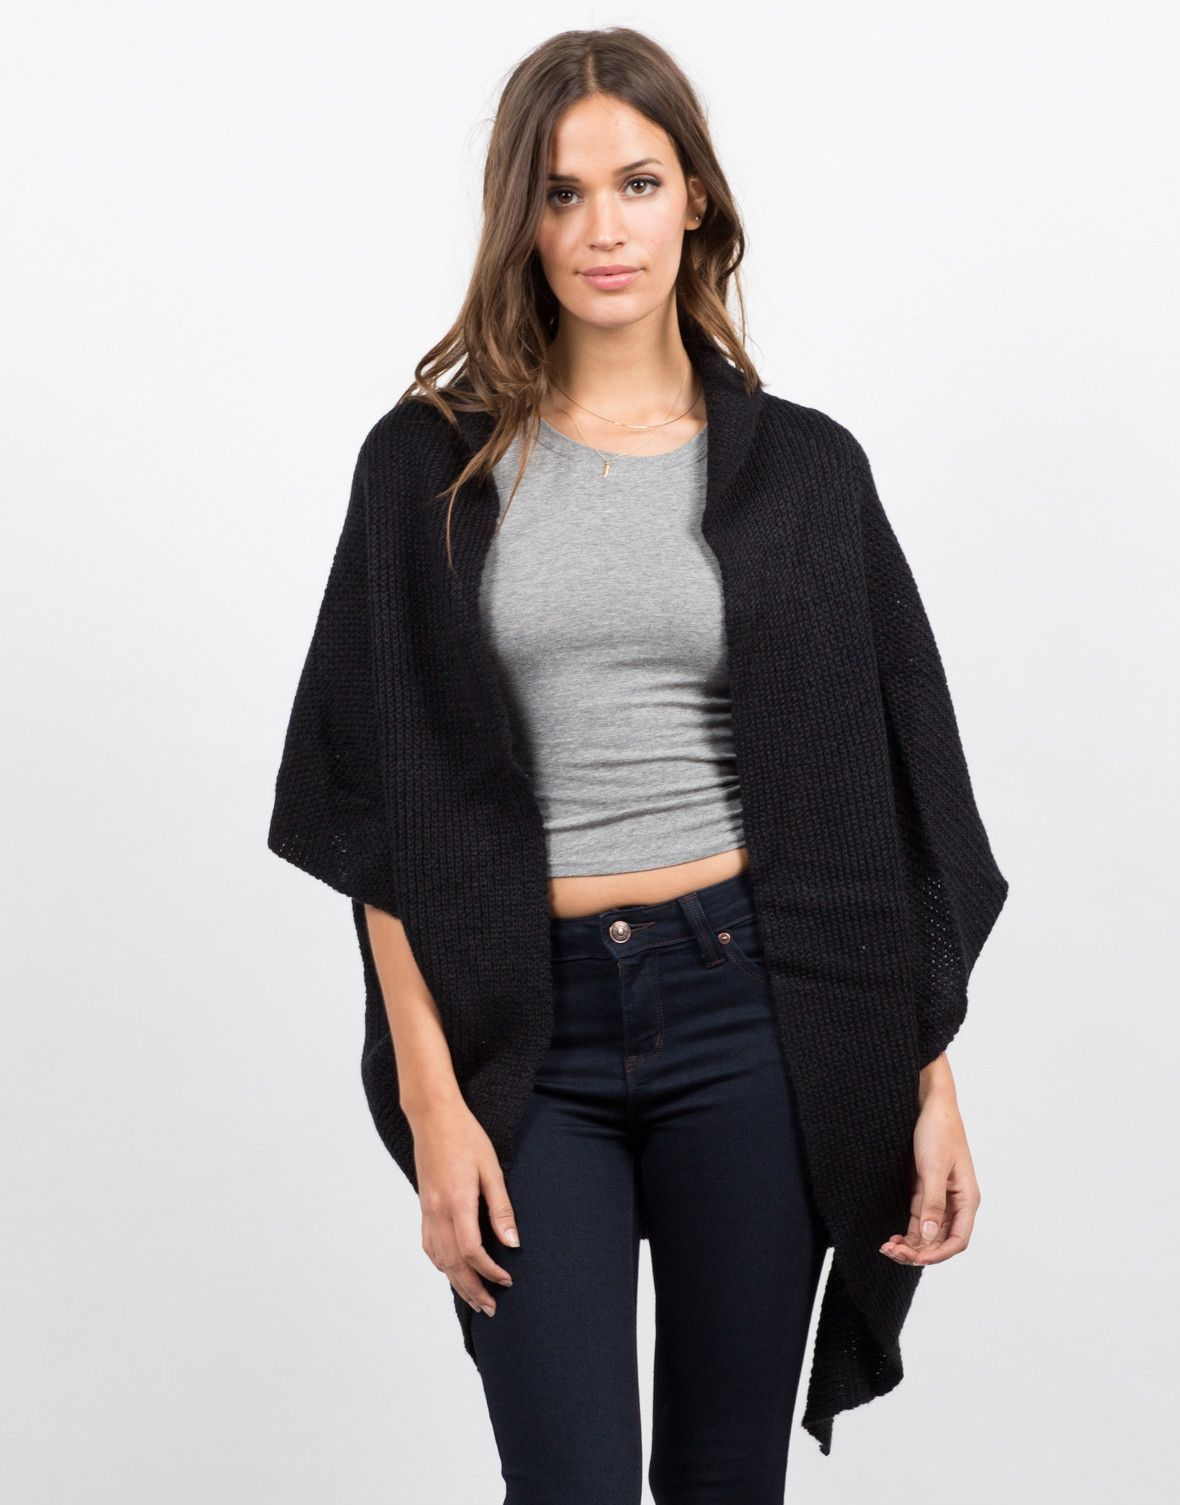 Knitted Short Sleeve Cardigan | Shorts, Short sleeves and Sleeve